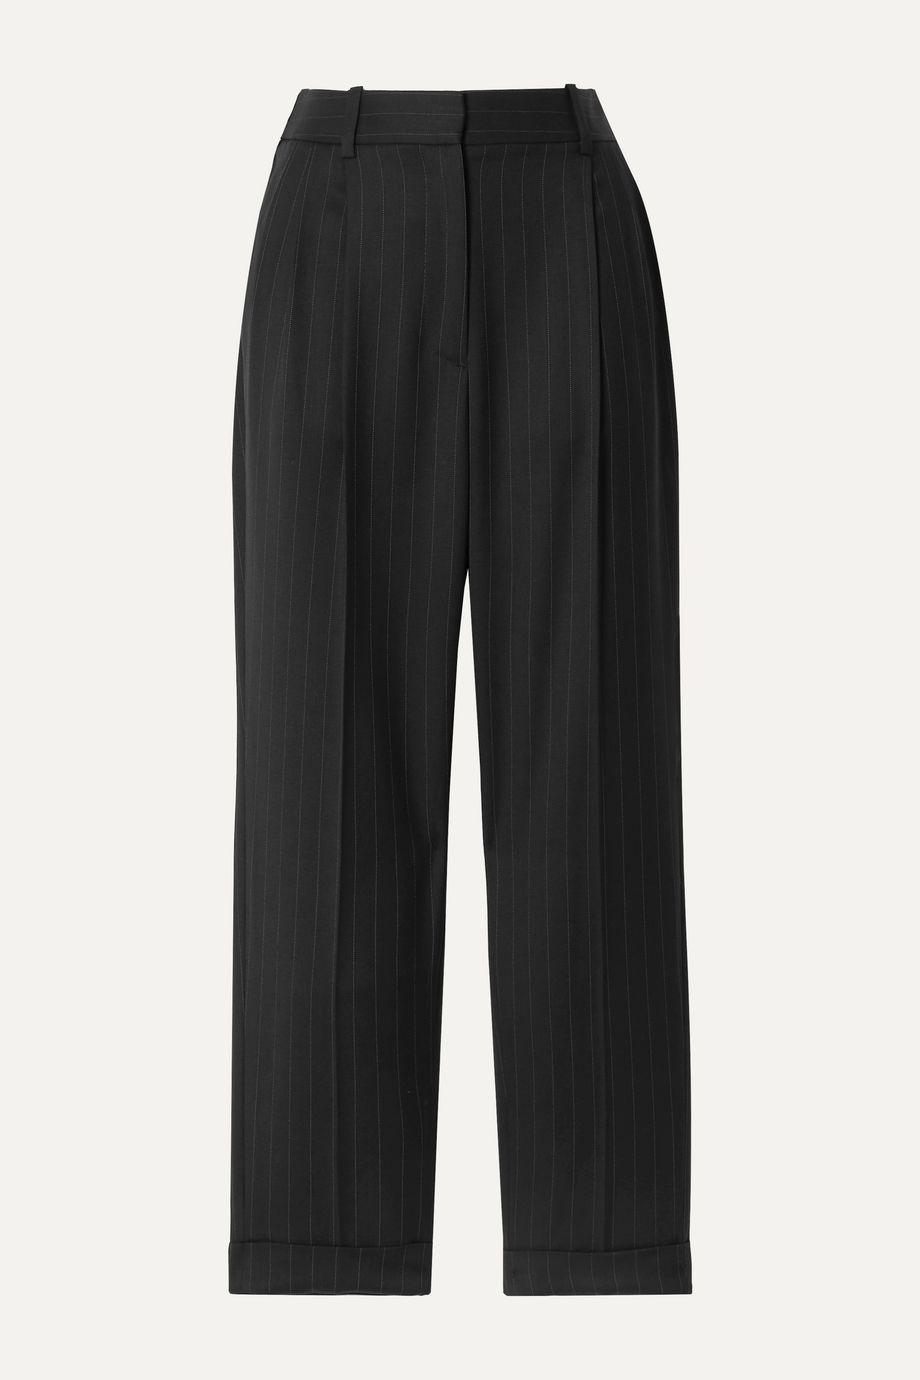 Nili Lotan Montana cropped pinstriped wool-blend twill tapered pants